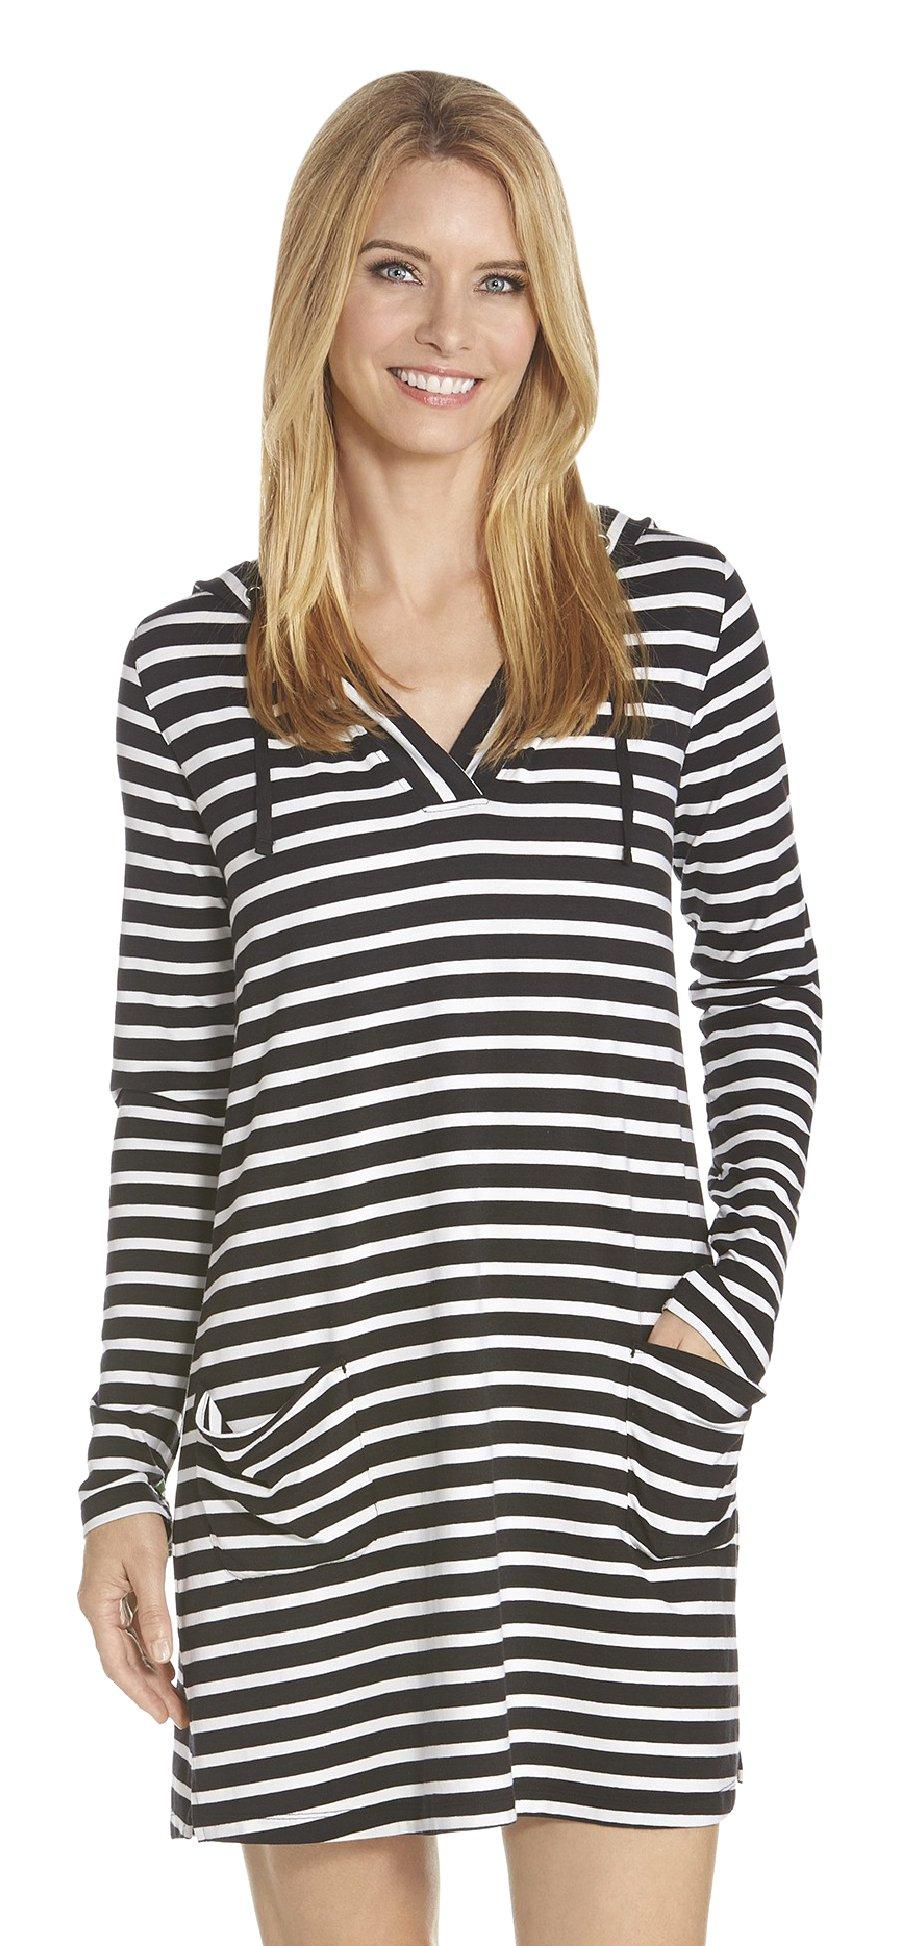 96687eeab8c Coolibar UPF 50+ Women s Beach Cover-up Dress - Sun Protective (Small-  Black White Stripe) Sports Apparel